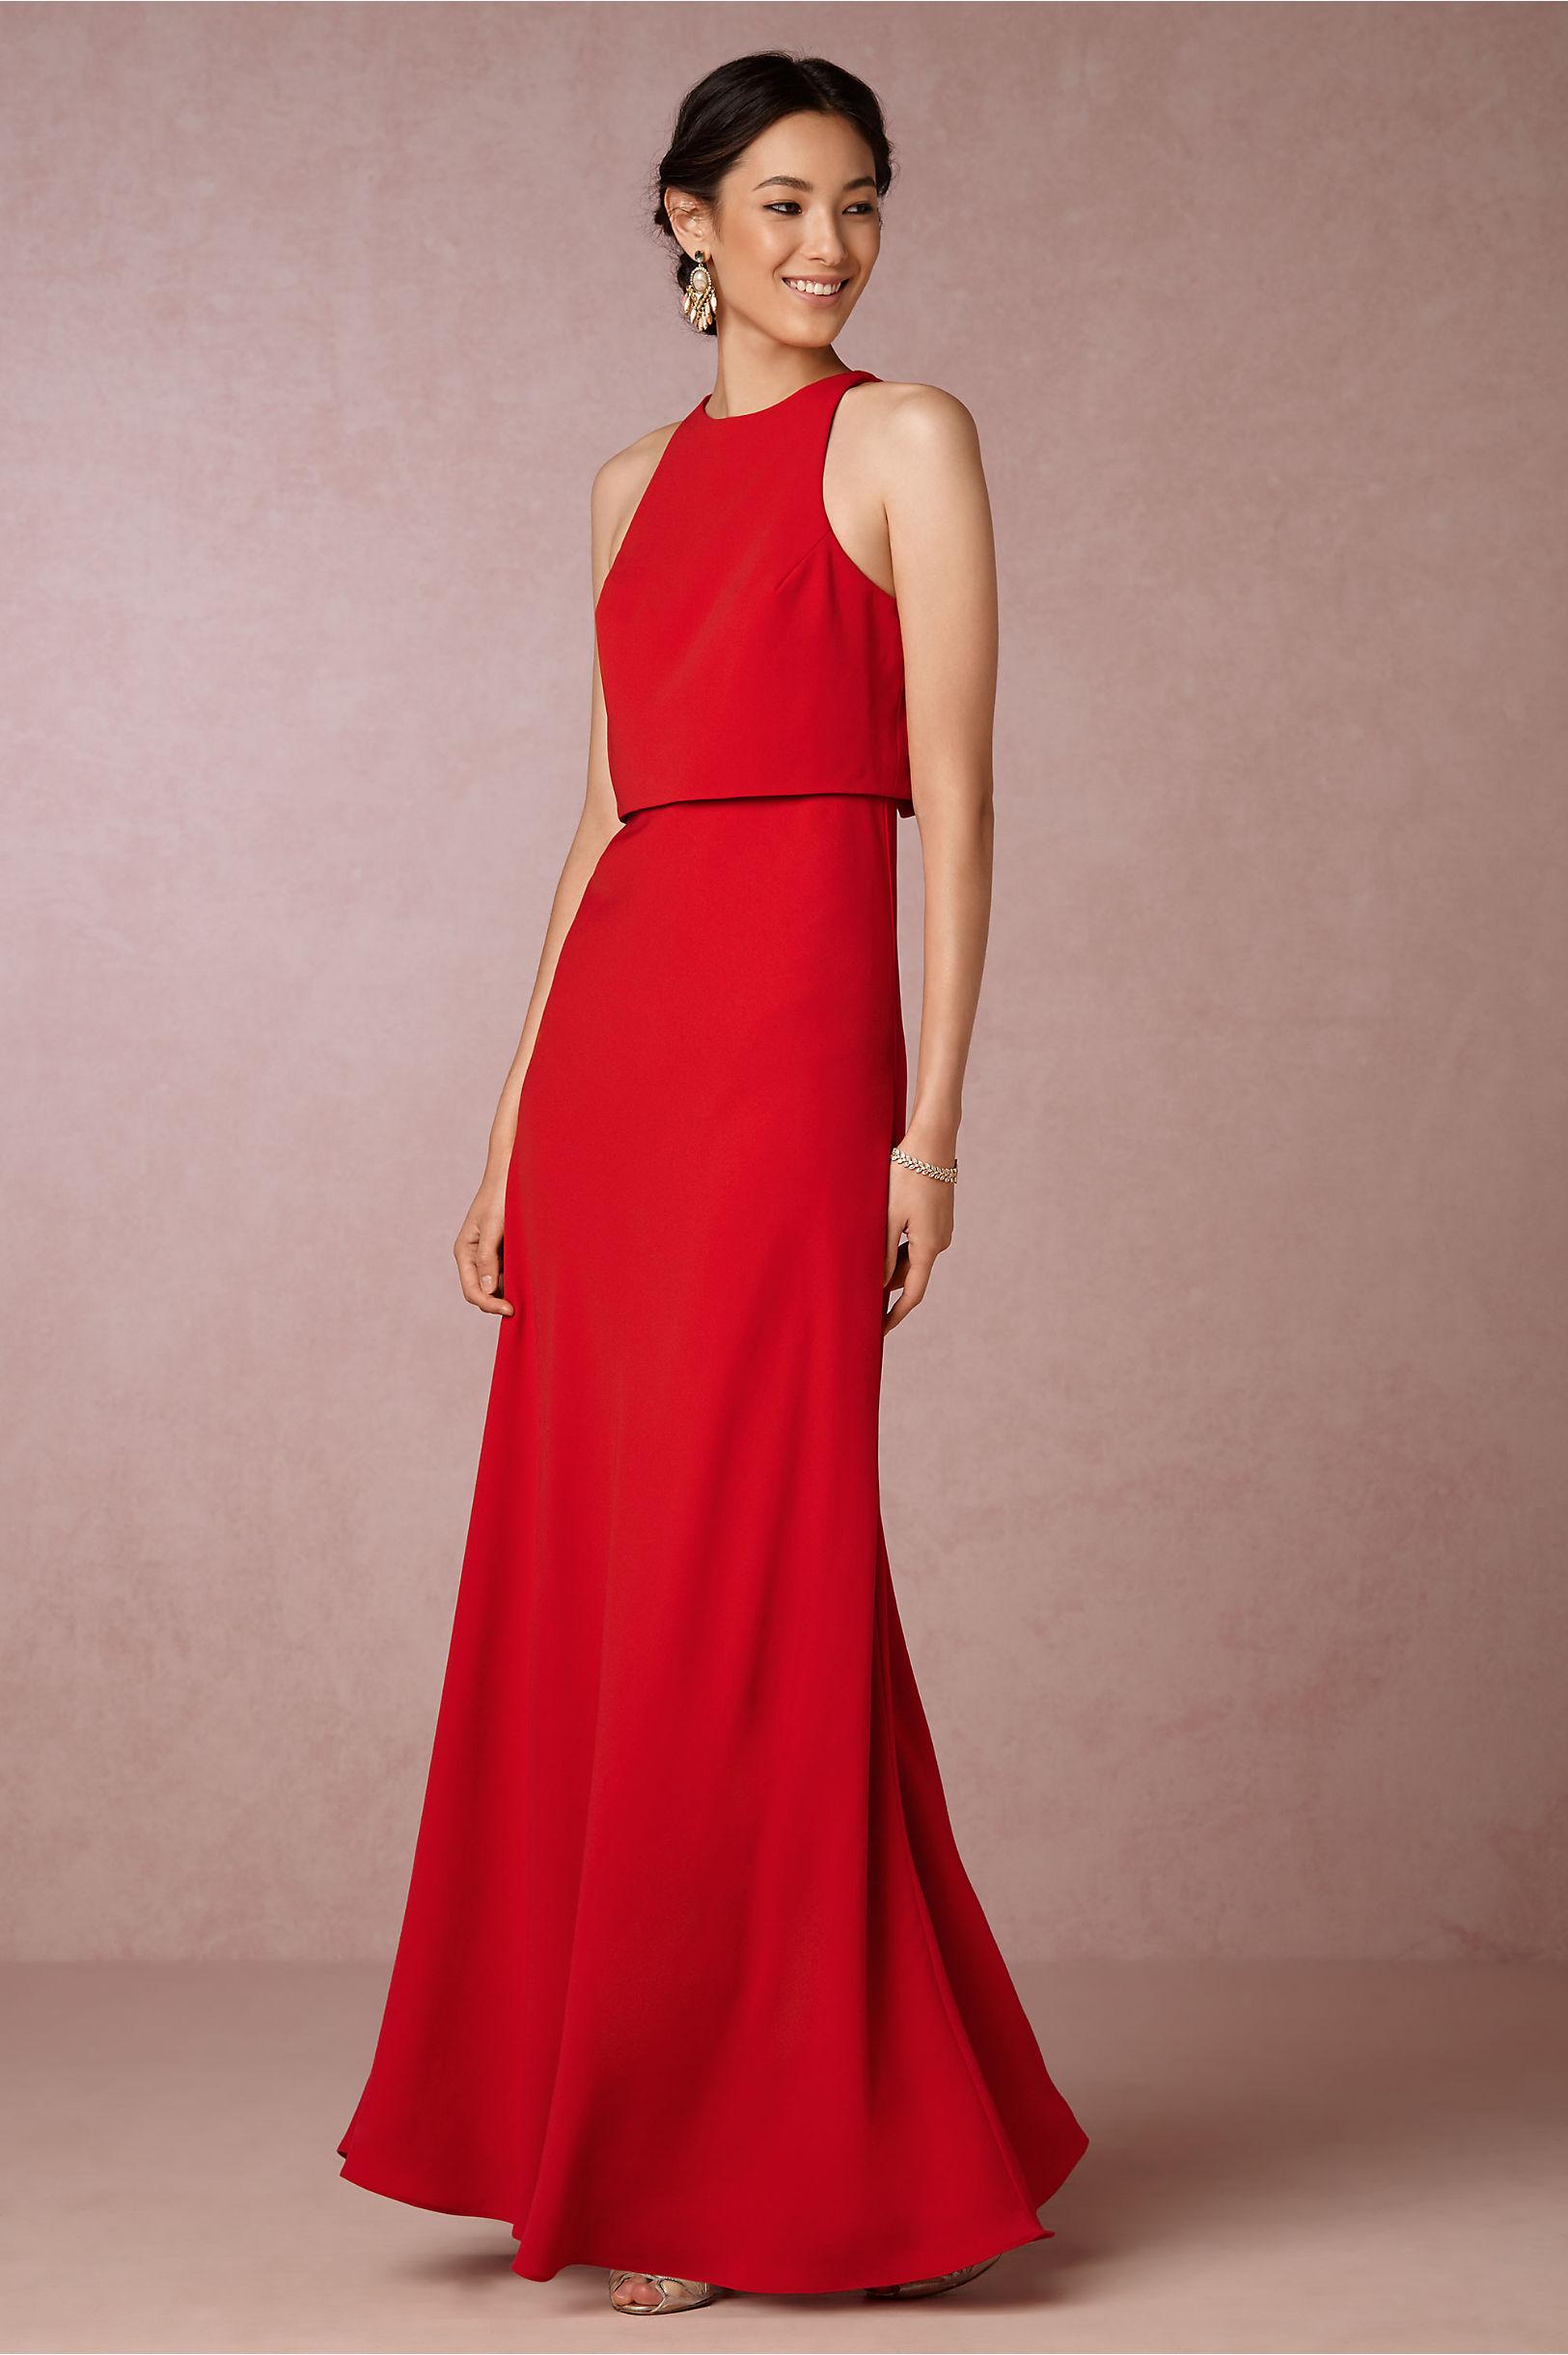 Iva Crepe Maxi in Sale Dresses | BHLDN